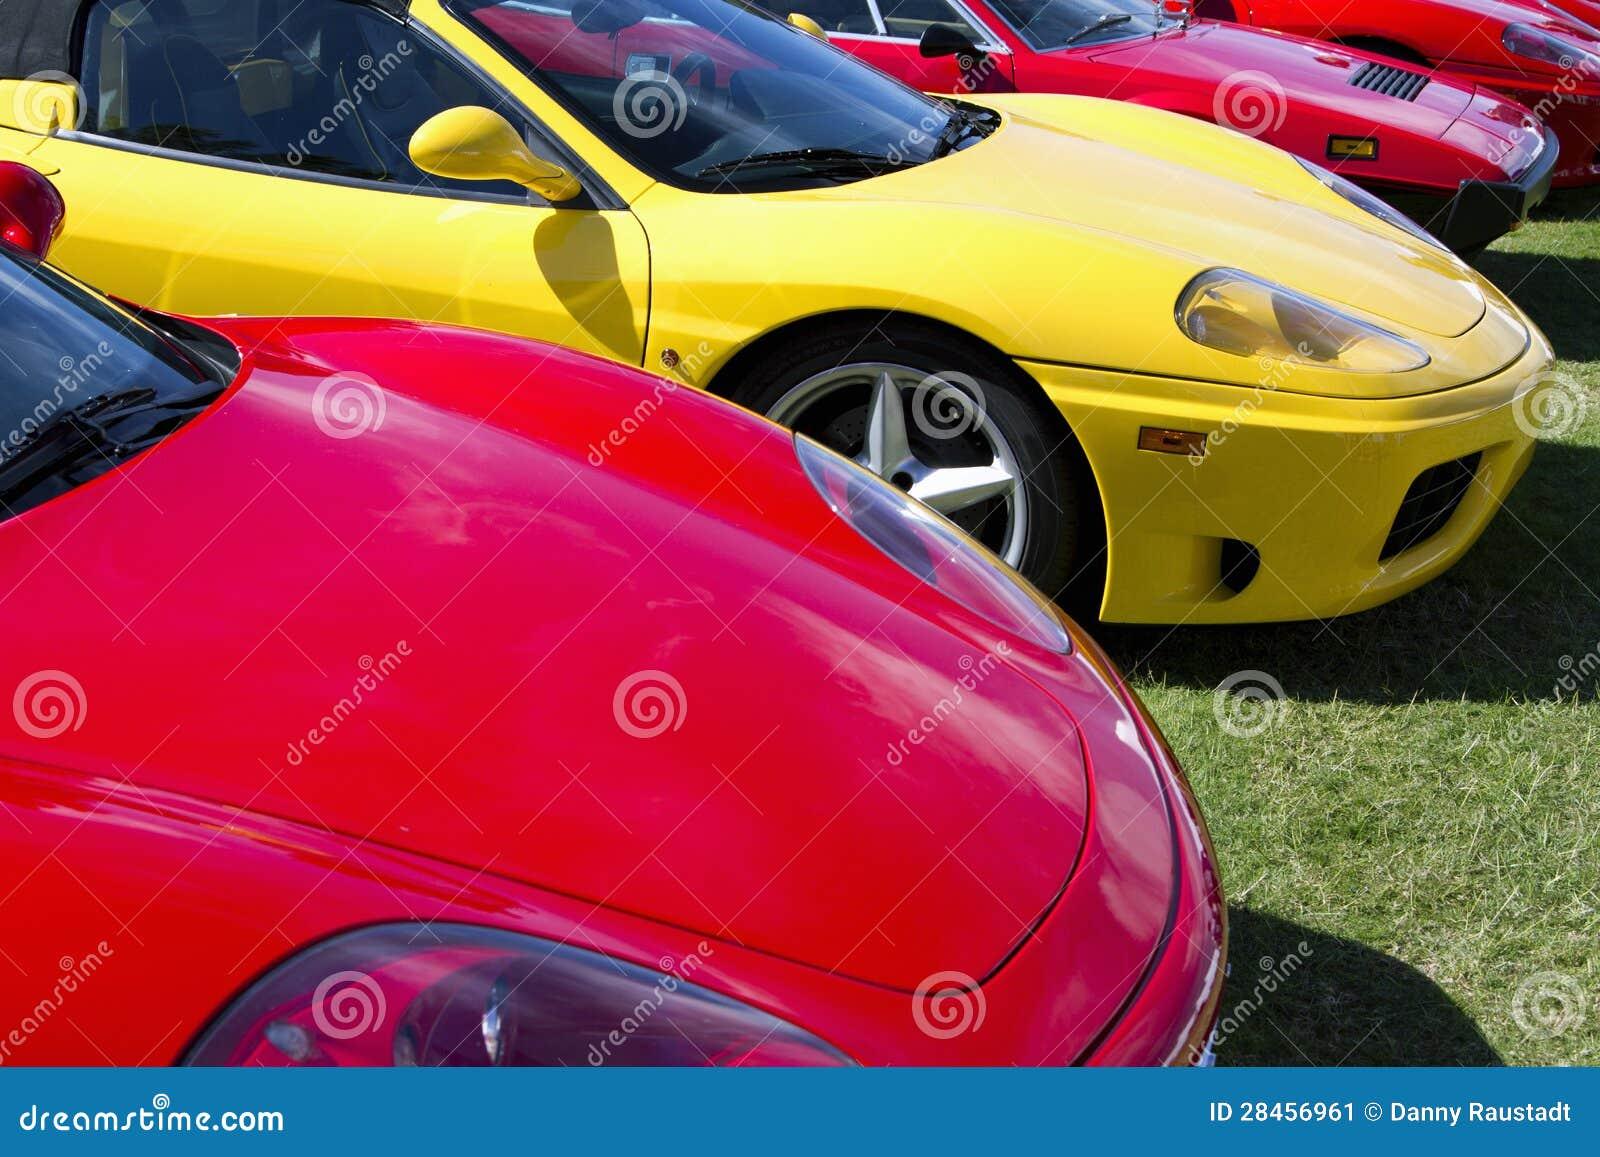 Pictures Of Cartoons Cars.html | Autos Weblog